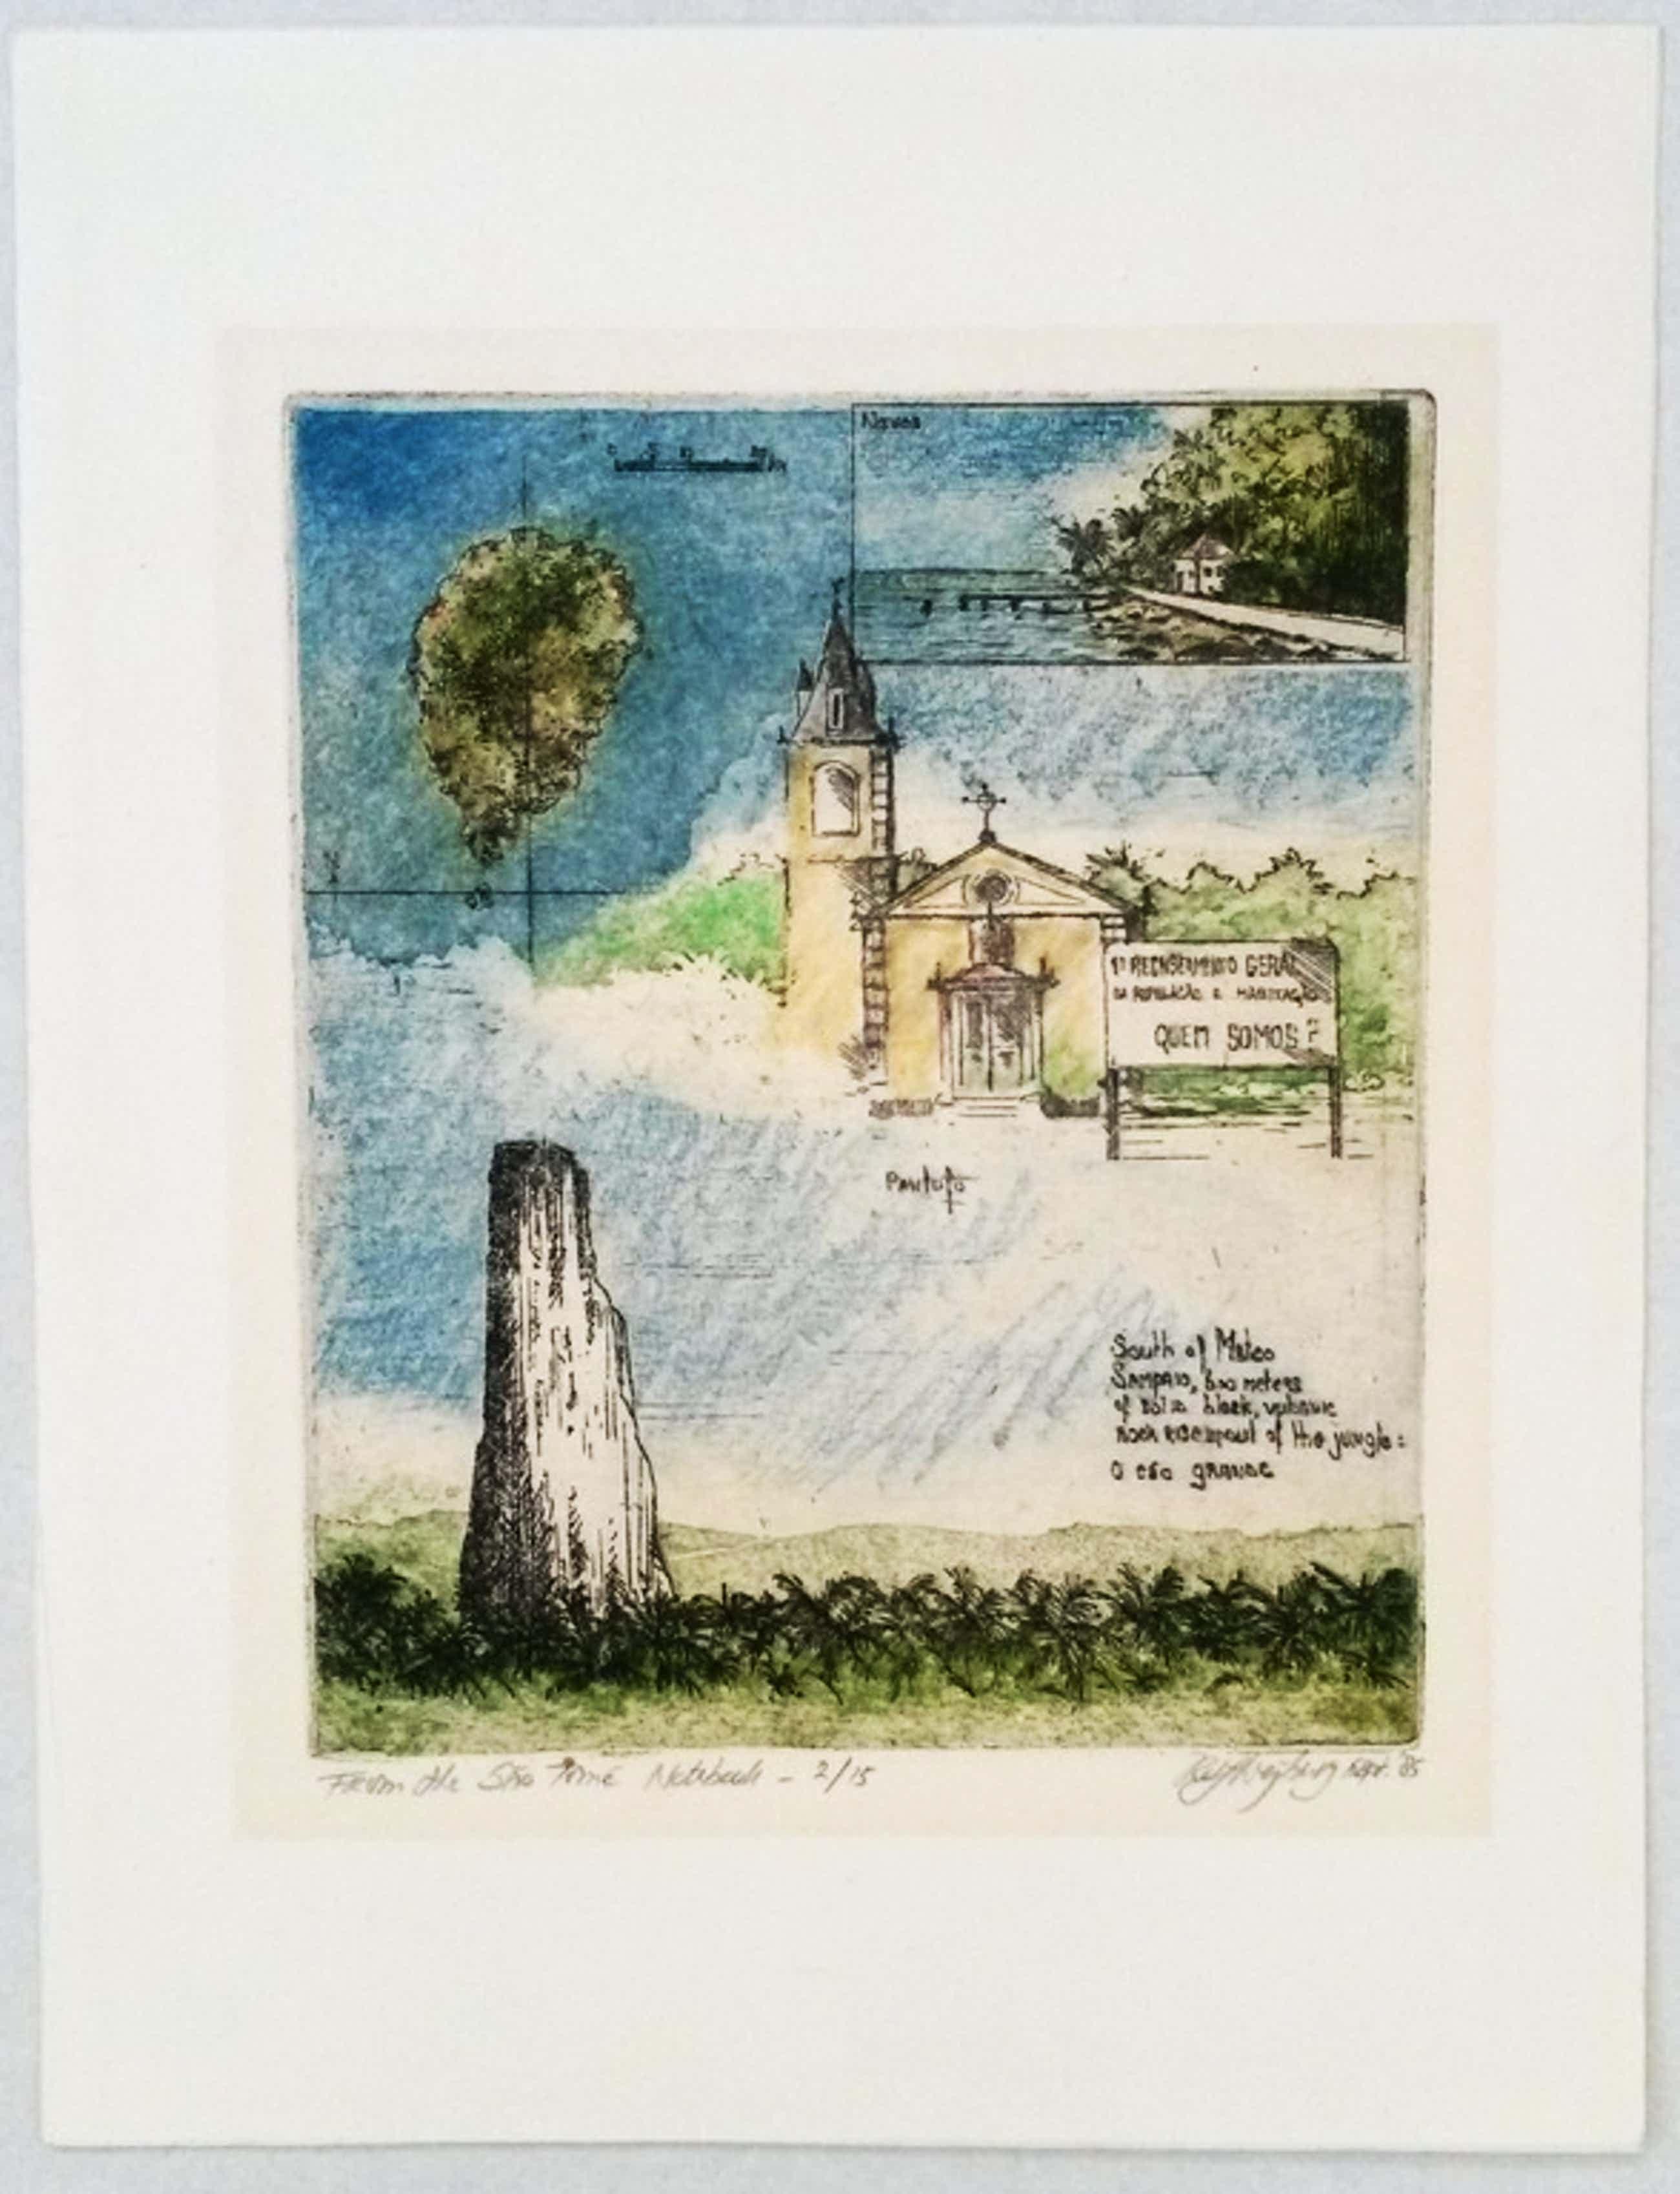 Rolf Weijburg - kleurenets - From the Sao Tomé Notebook kopen? Bied vanaf 40!